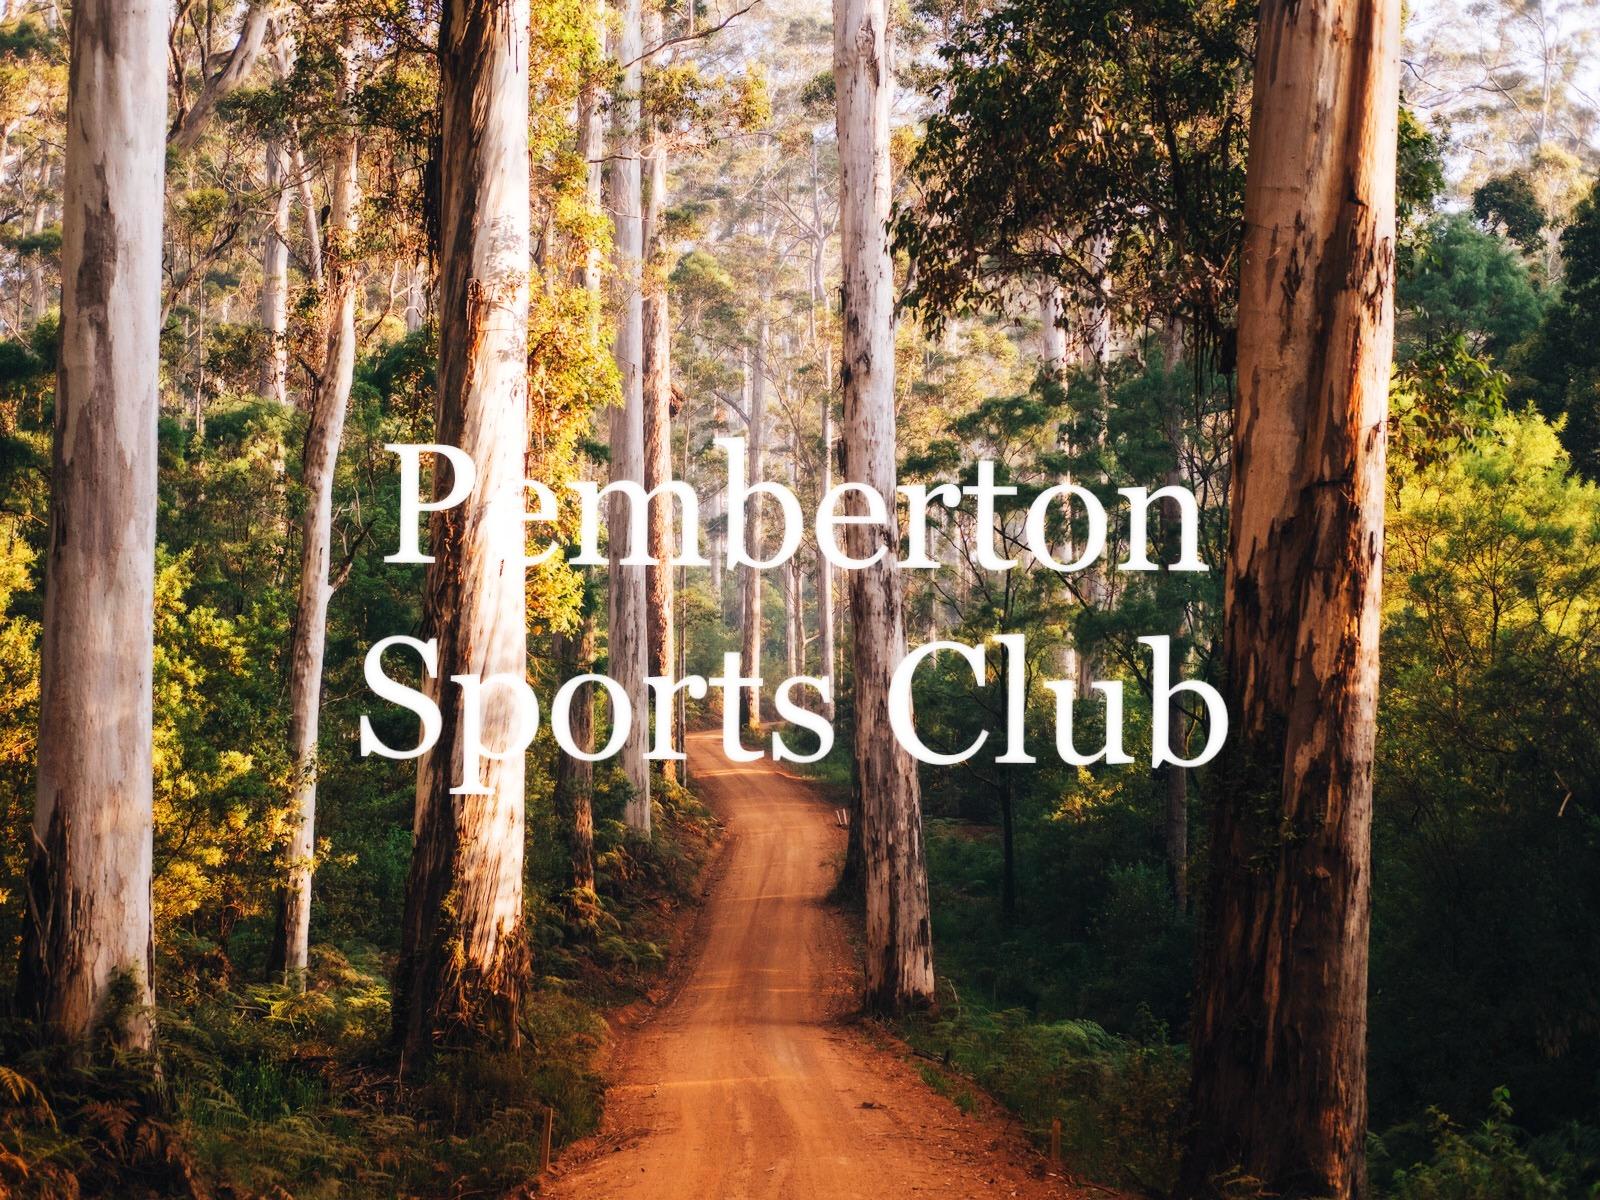 - 9.00am - All LevelsAddress: 1 Club Road, Pemberton